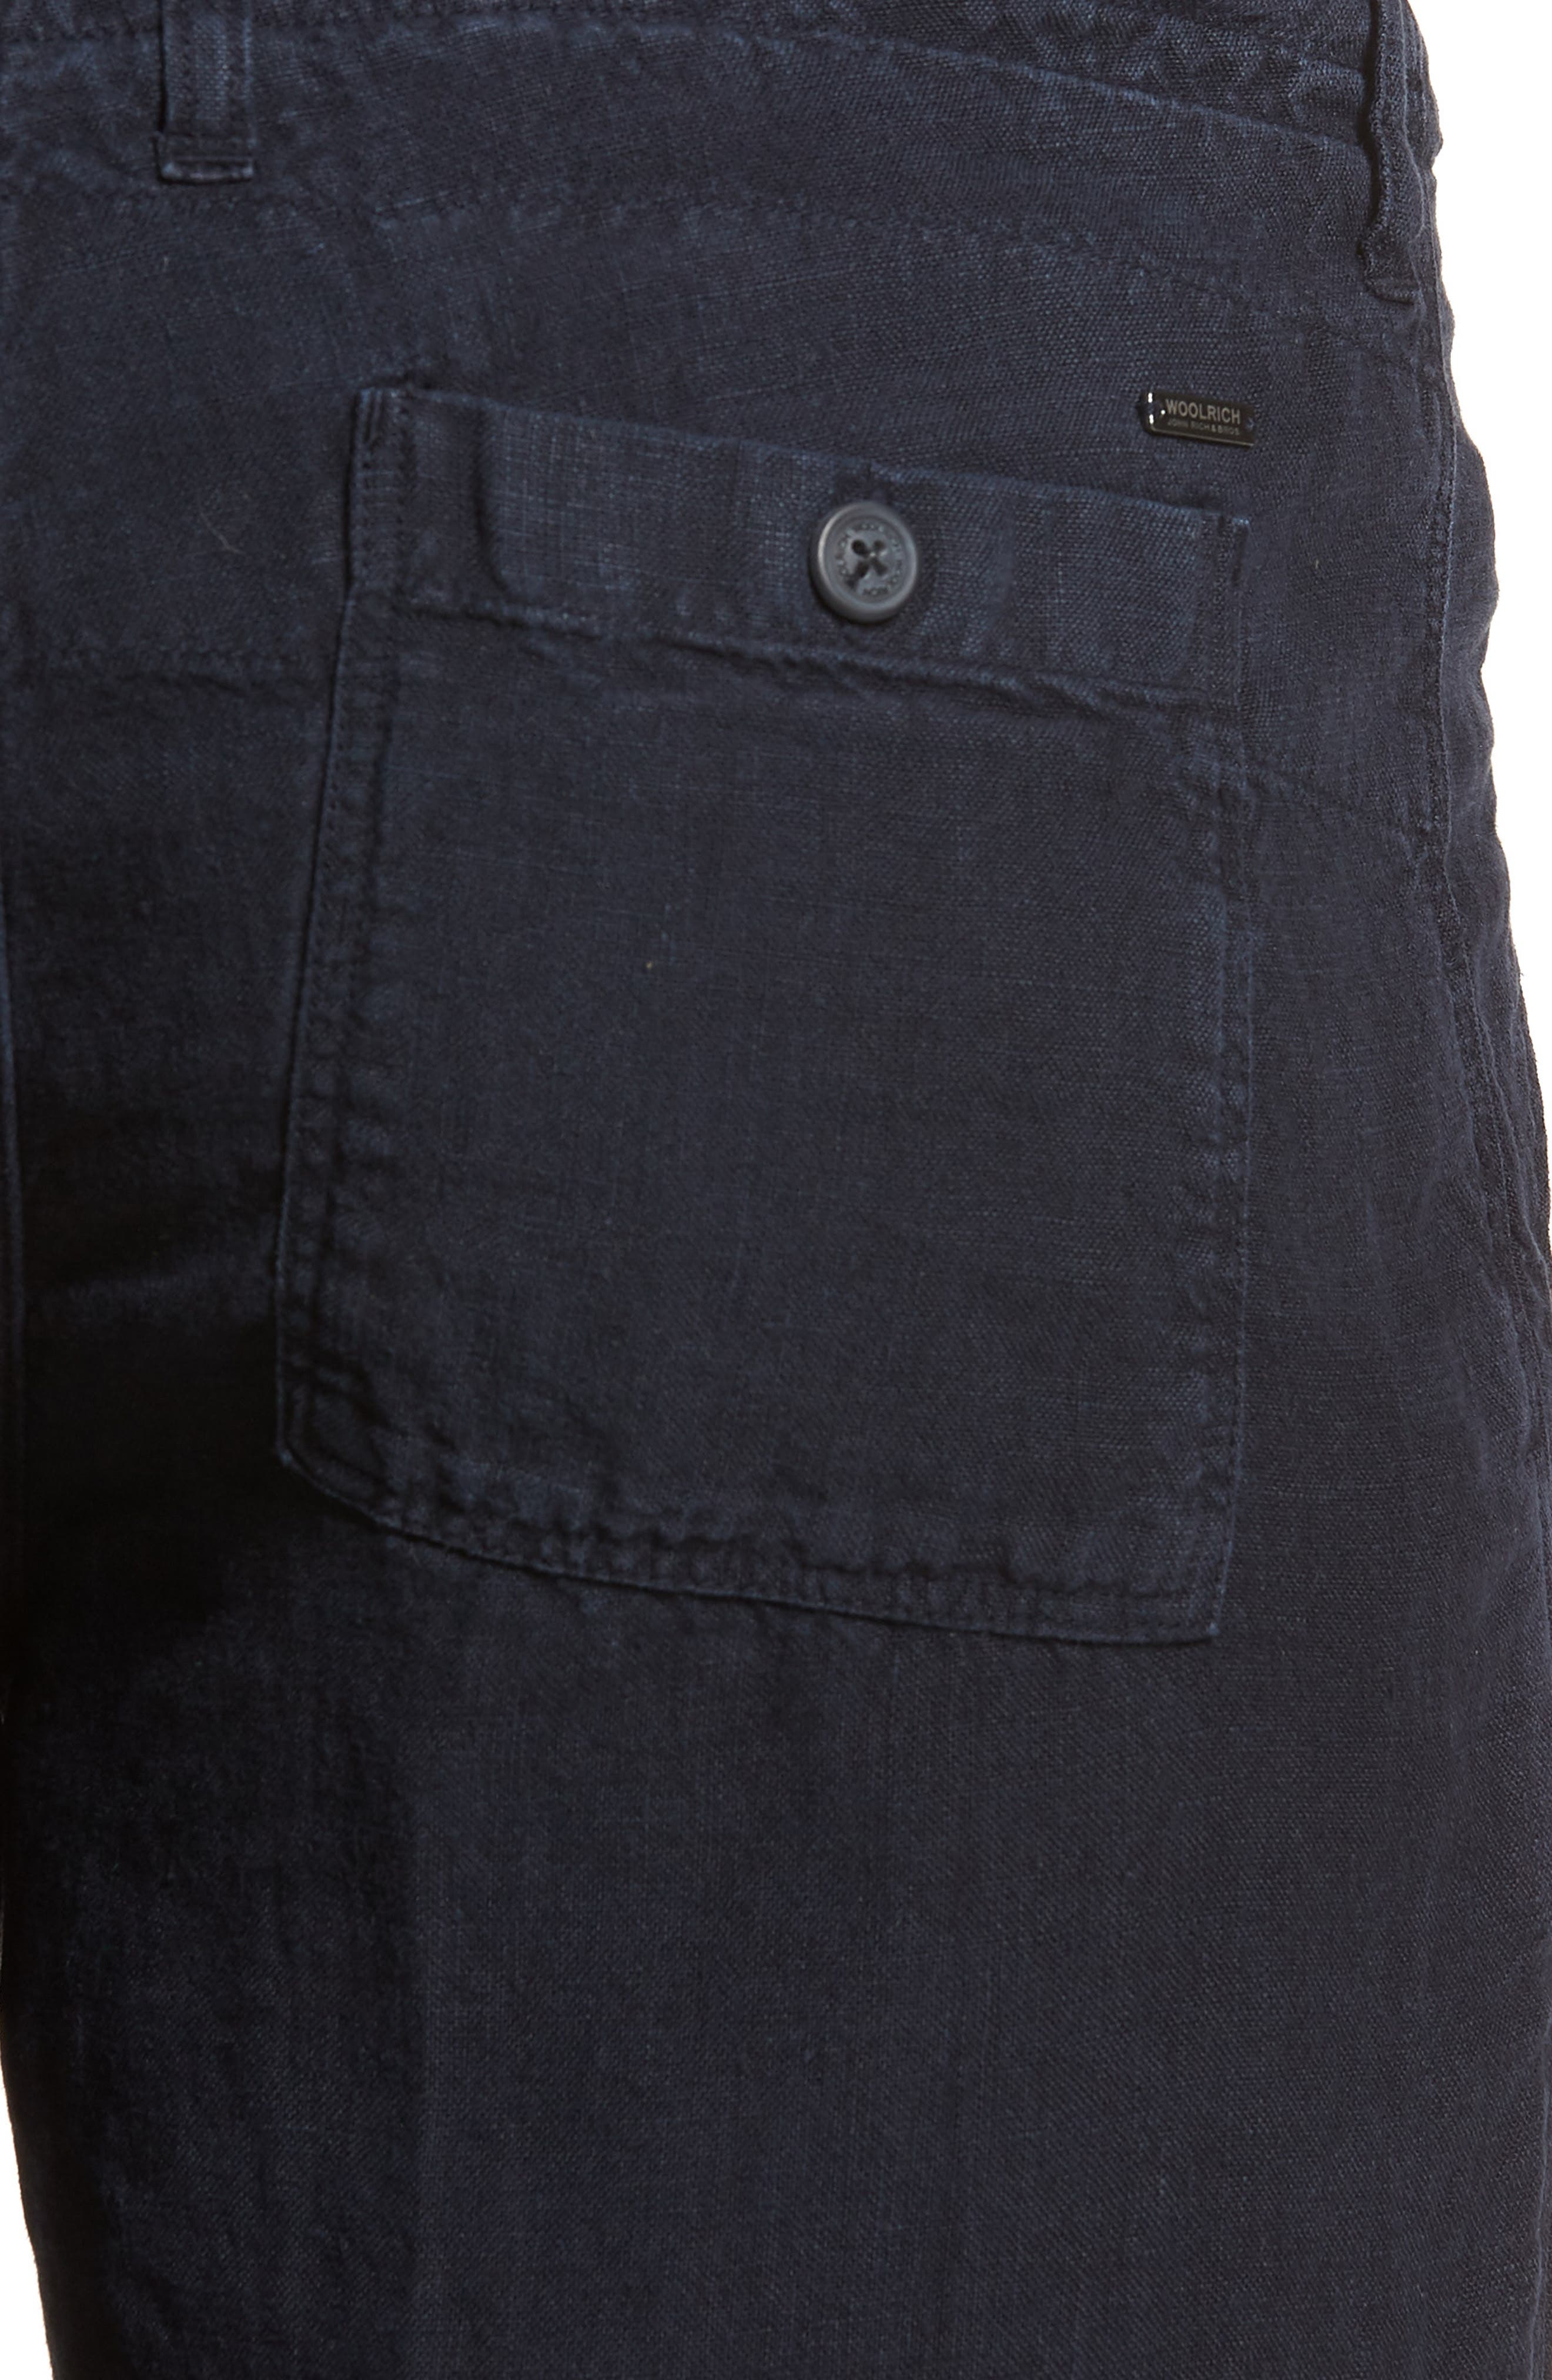 & Bros. Linen Shorts,                             Alternate thumbnail 4, color,                             400